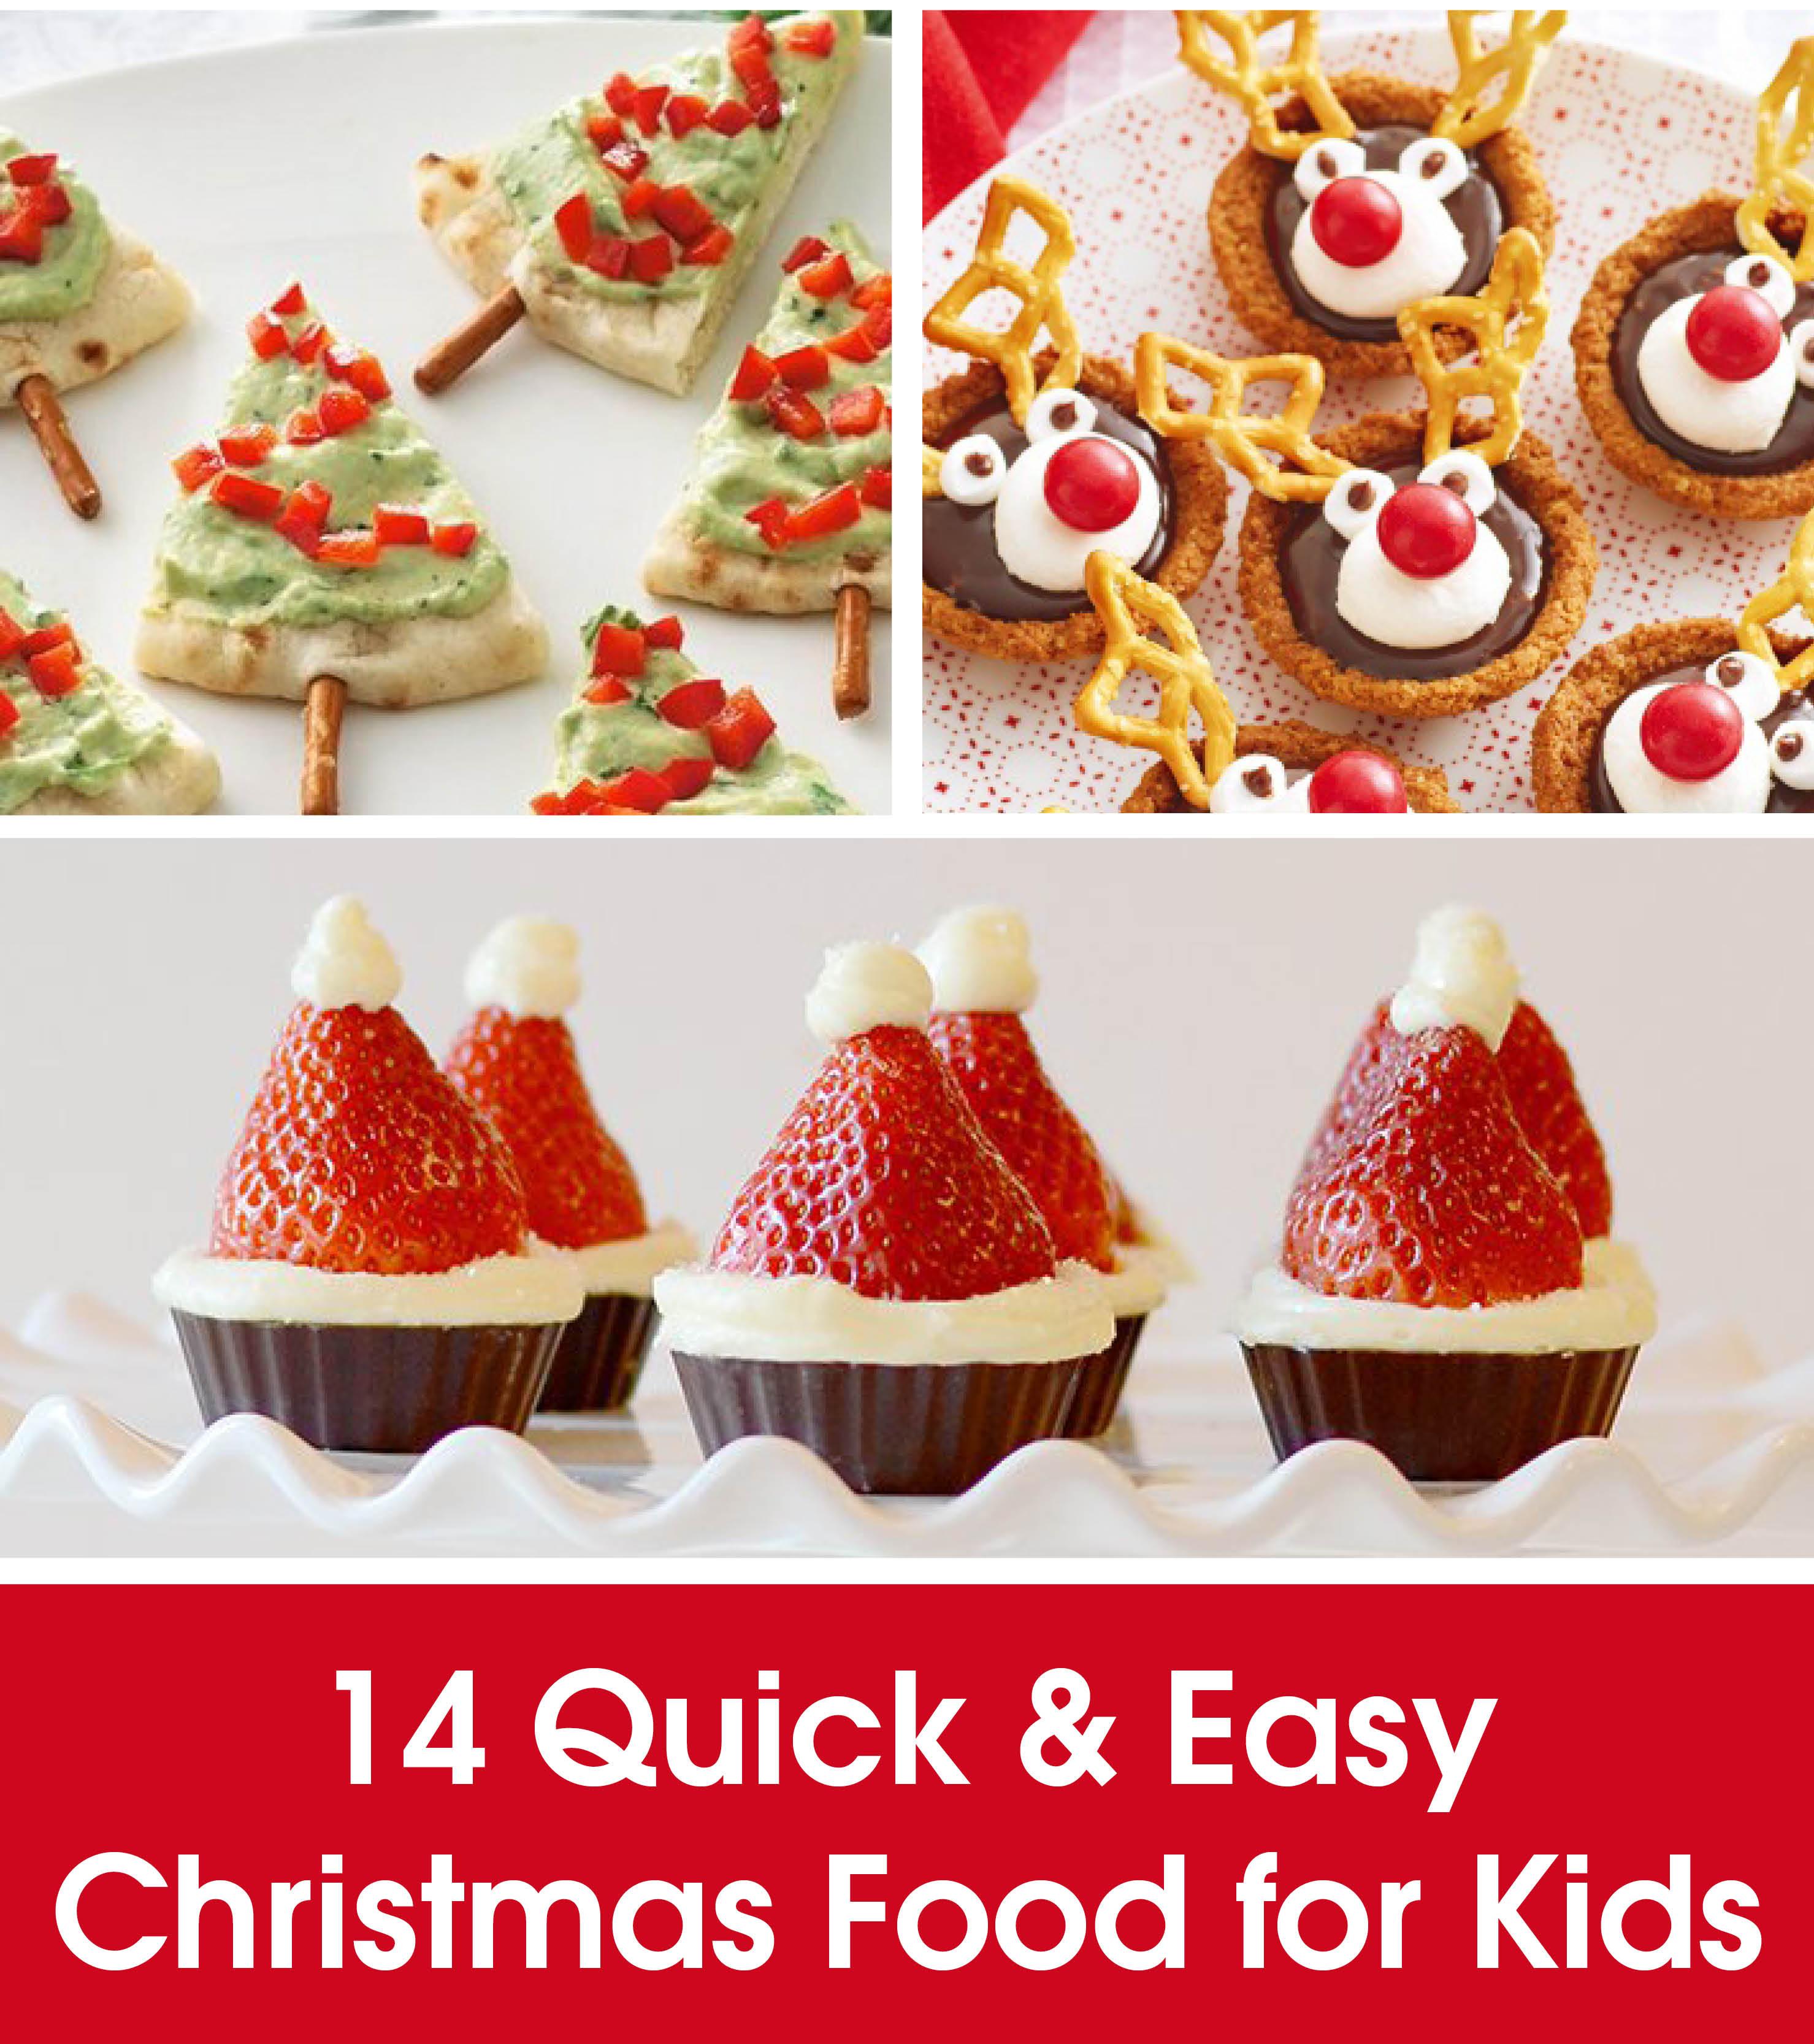 Christmas Dinners For Kids  QUICK & EASY CHRISTMAS FOOD FOR KIDS